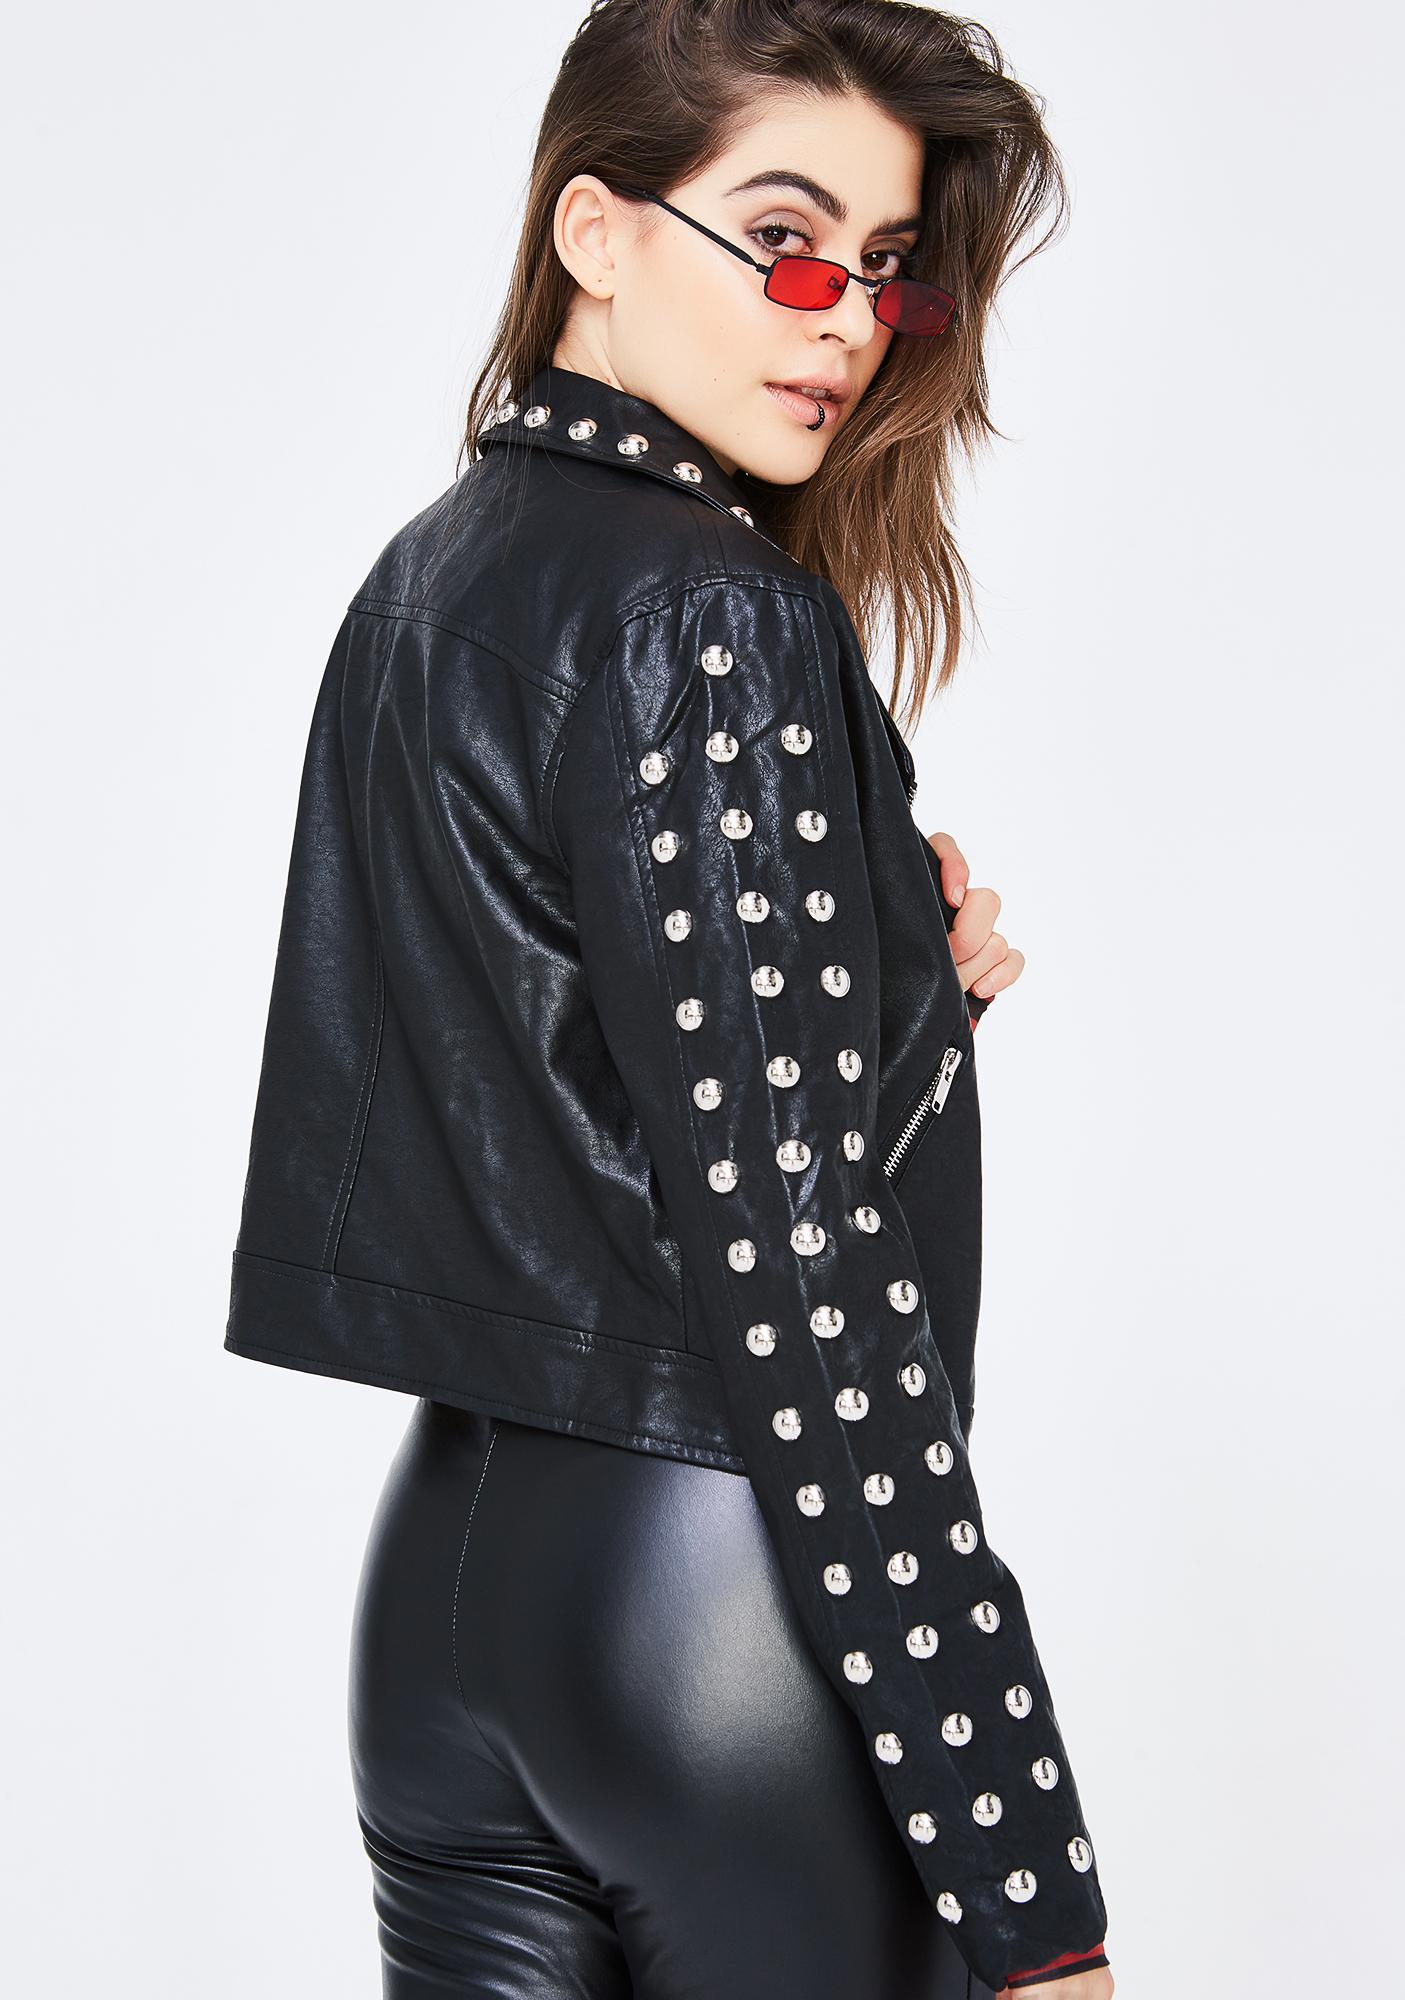 Never Cared Studded Jacket